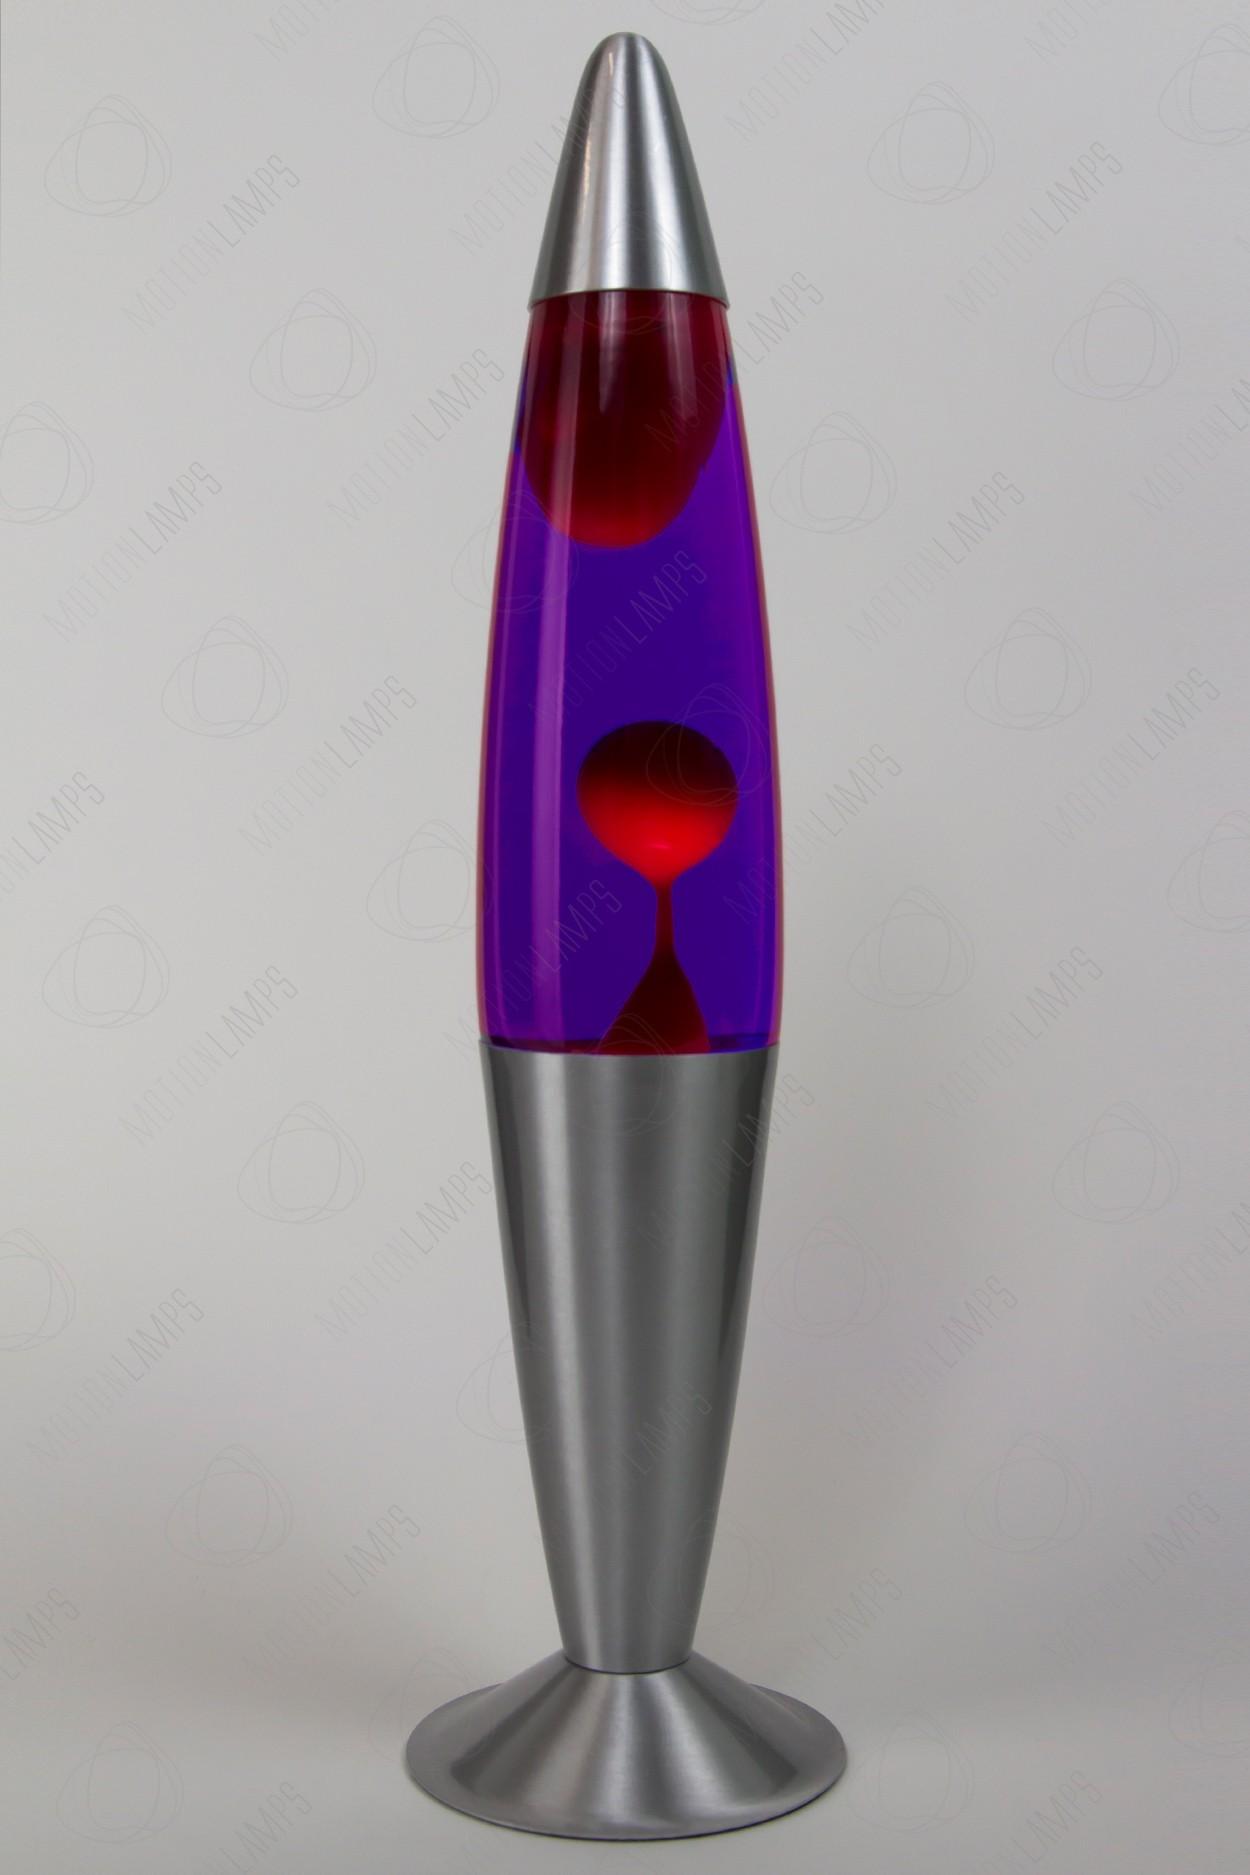 Лава-лампа 41см Красная/Фиолетовая (Воск)